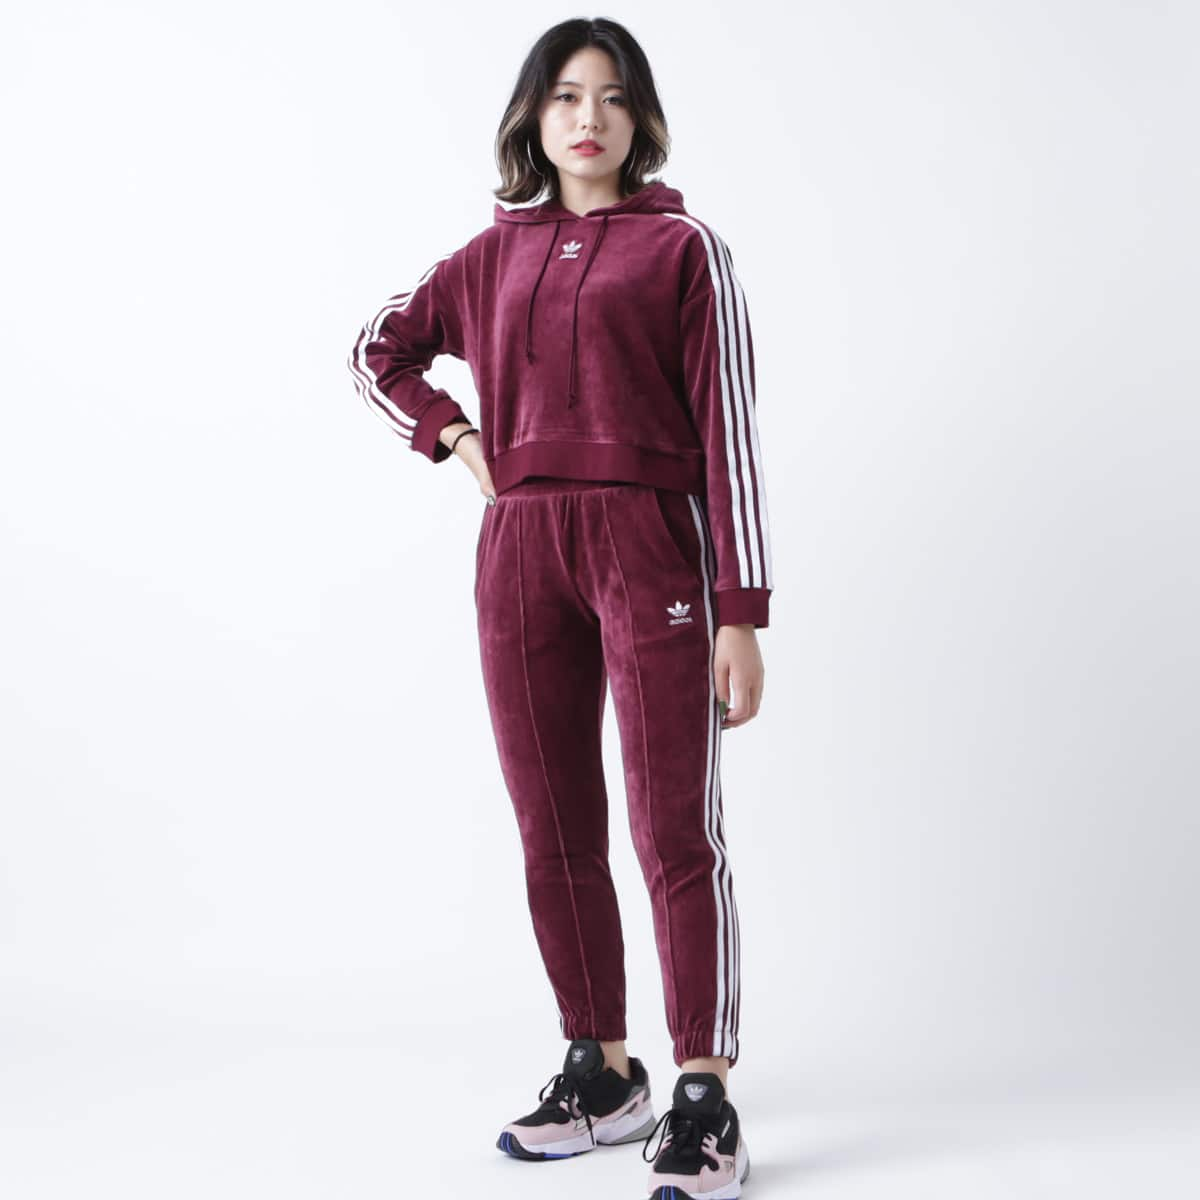 adidas Originals REGULAR TRACK PANTS CUF MAROON 18FW-I_photo_large